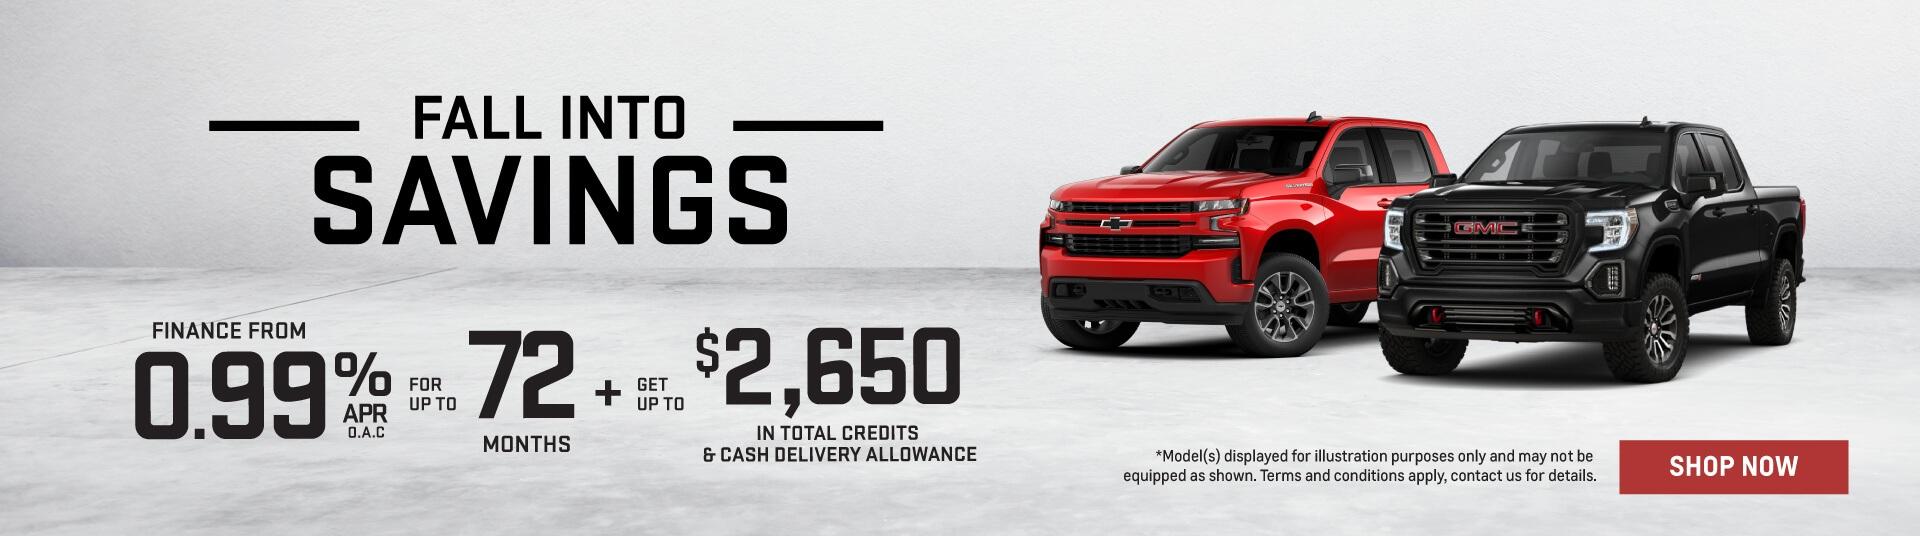 Fall Into Savings GM Trucks - GM Trucks - Applewood Chevrolet Buick GMC